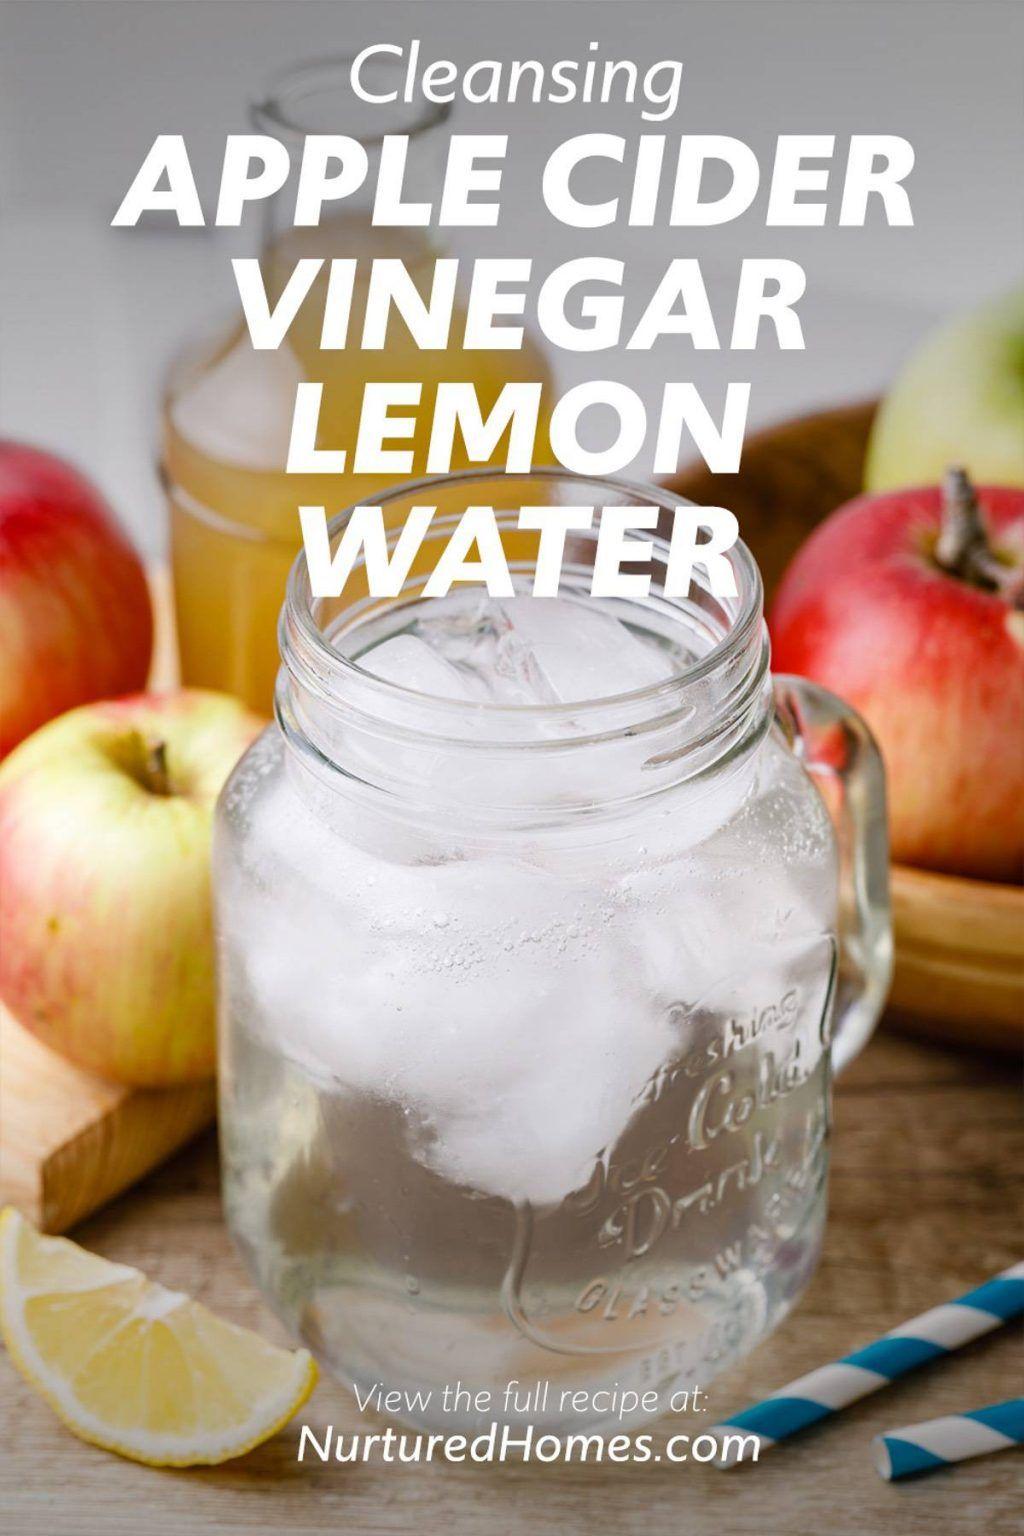 Apple Cider Vinegar Lemon Water - Nurtured Homes